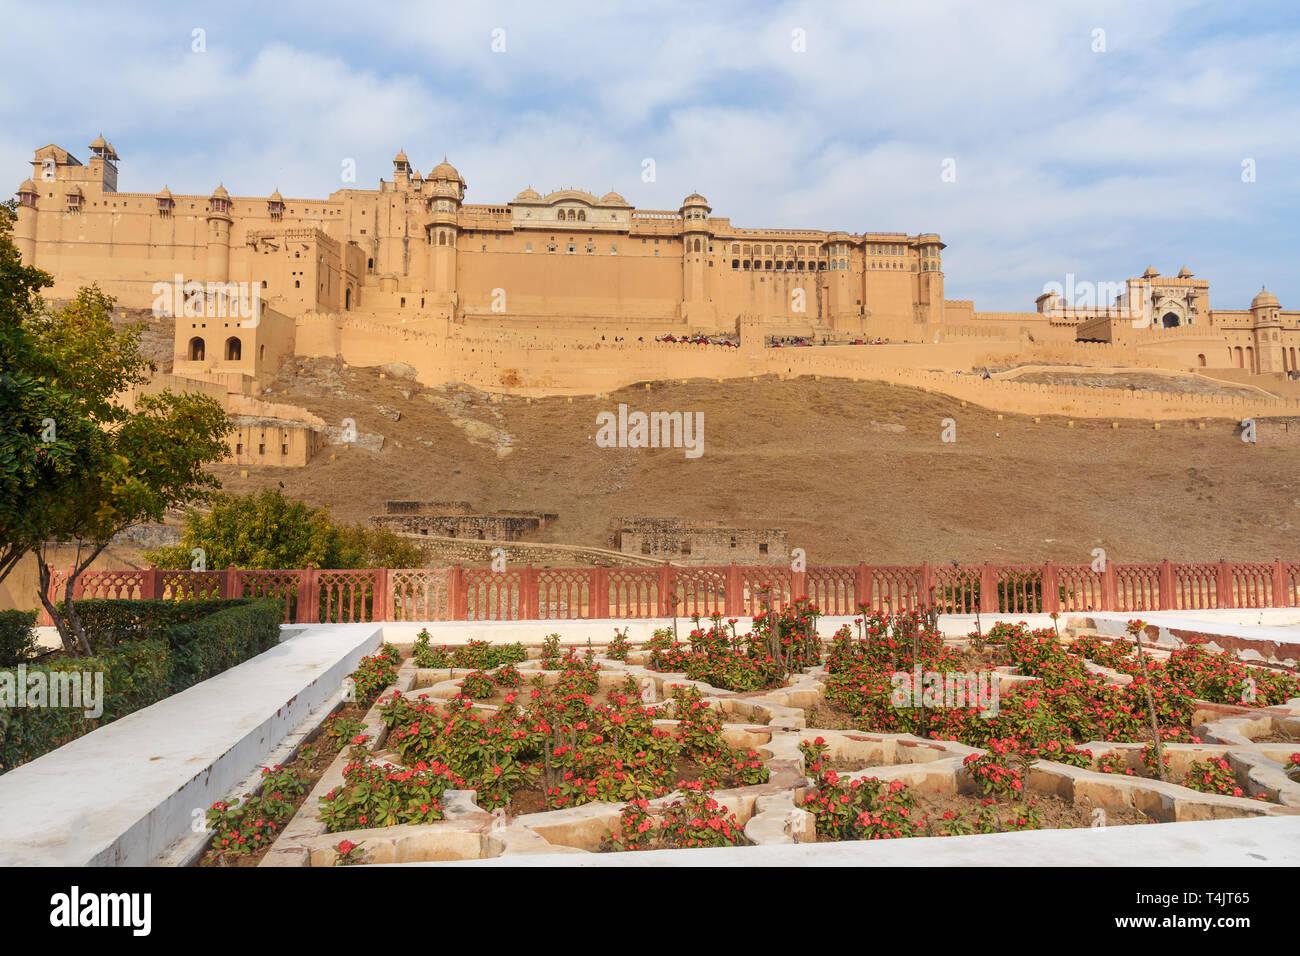 View of Amber fort and palace from Kesar Kyari Bagh garden on Maotha Lake. Jaipur. Rajasthan. India - Stock Image